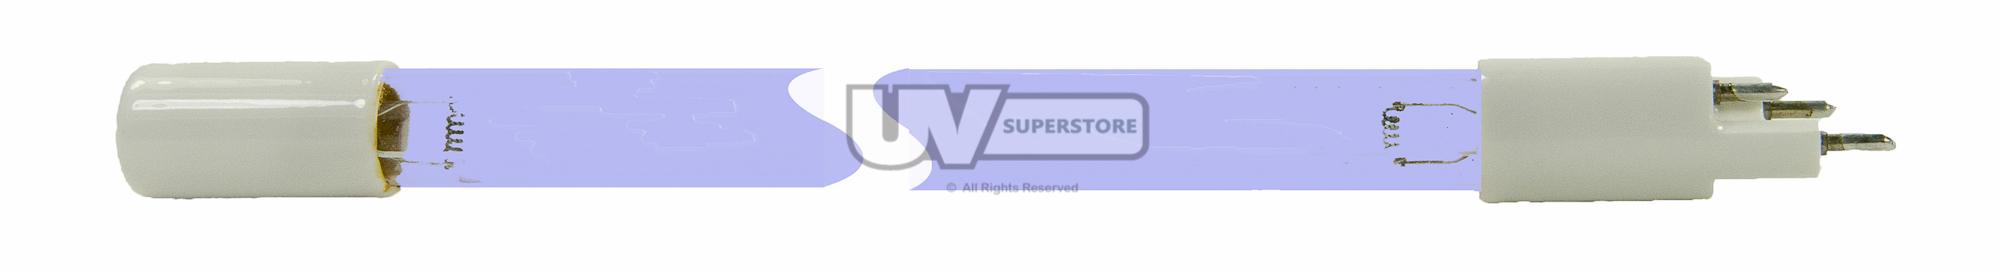 S810rl Replacement Uv Lamp 254nm Uv Superstore Inc